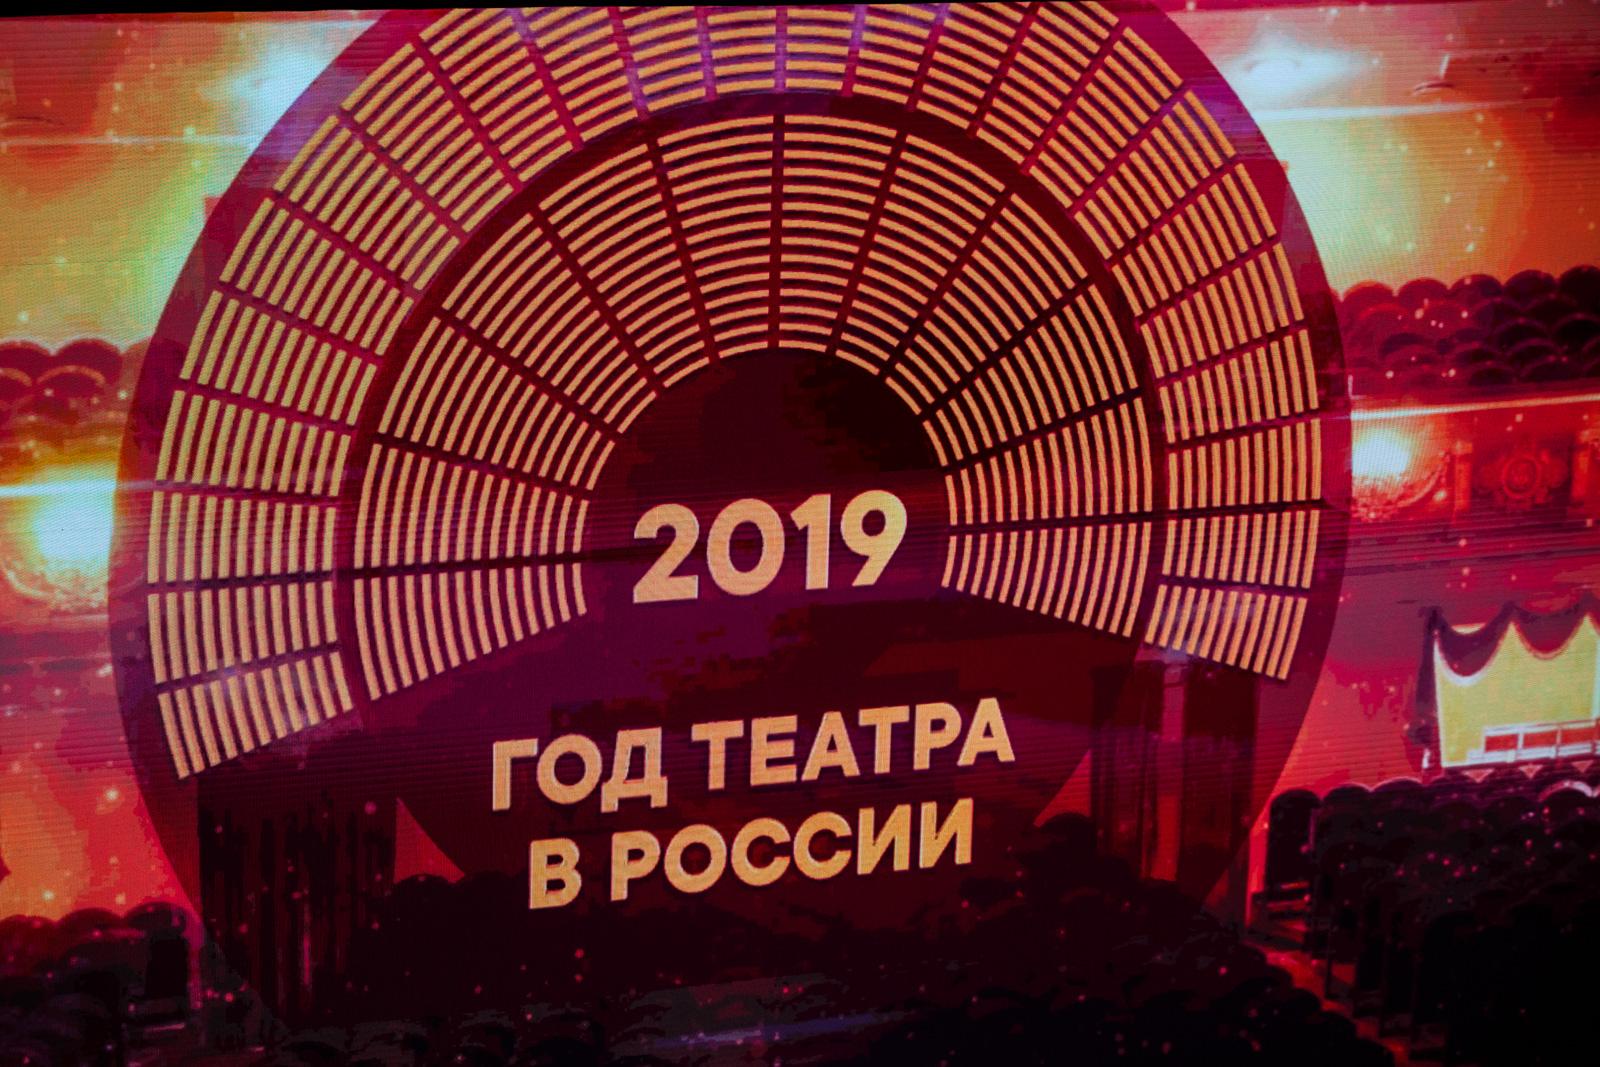 Картинка год театра 2019